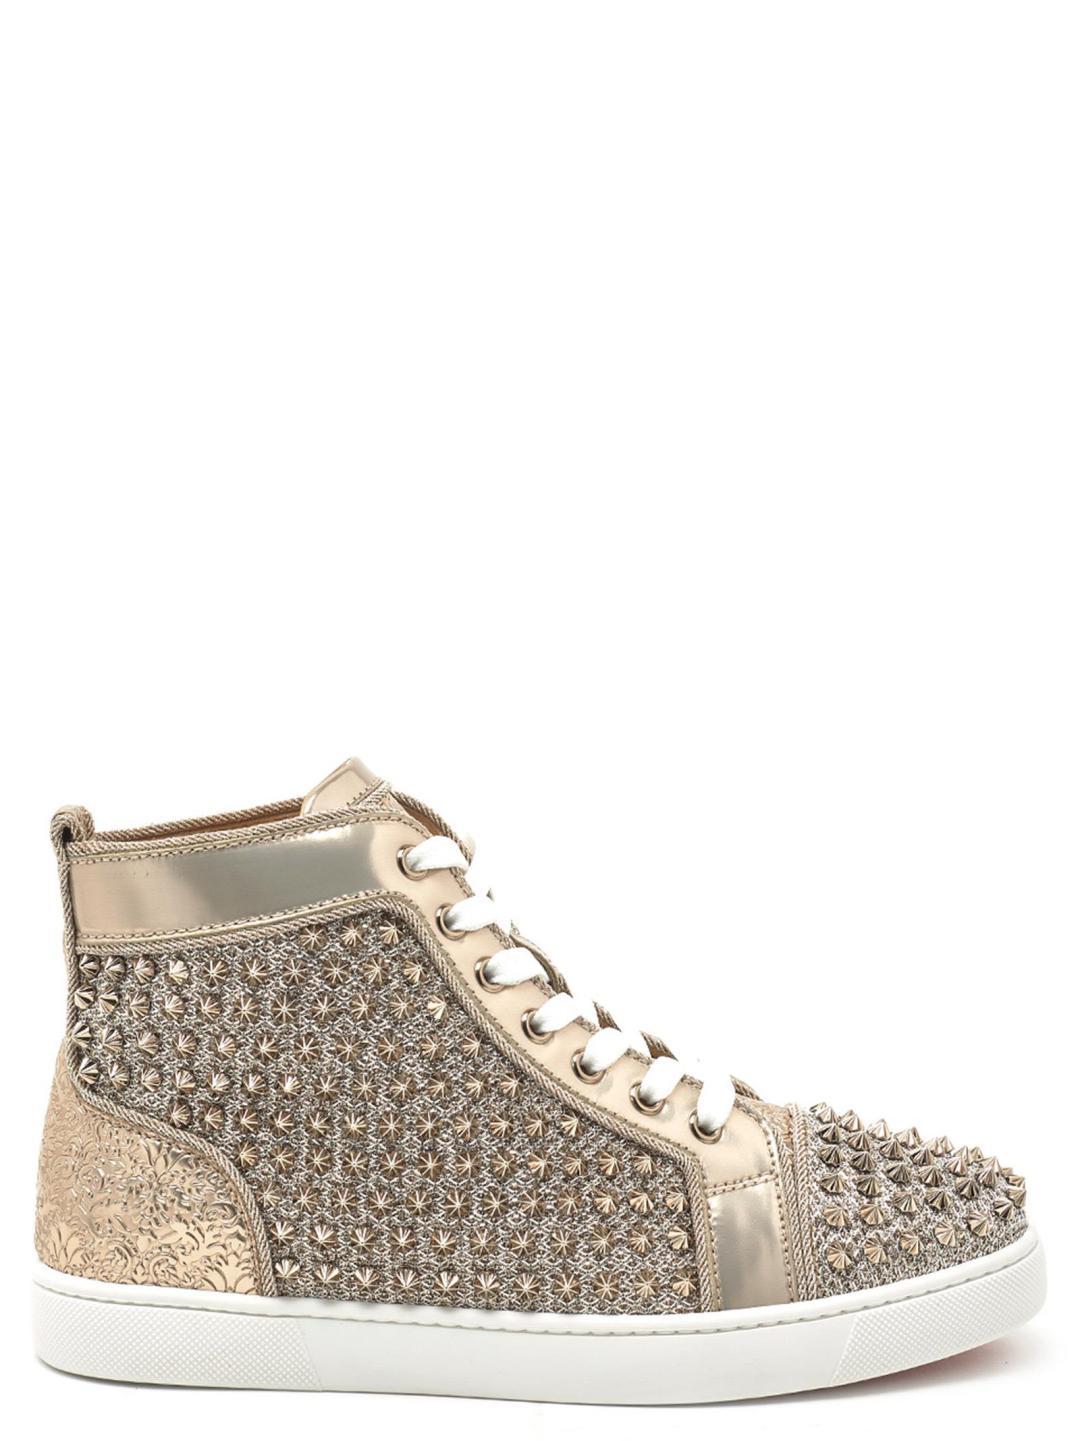 68ed2f4800f Christian Louboutin  louis Orlato Woman  Shoes – Italist.com US –  862.91